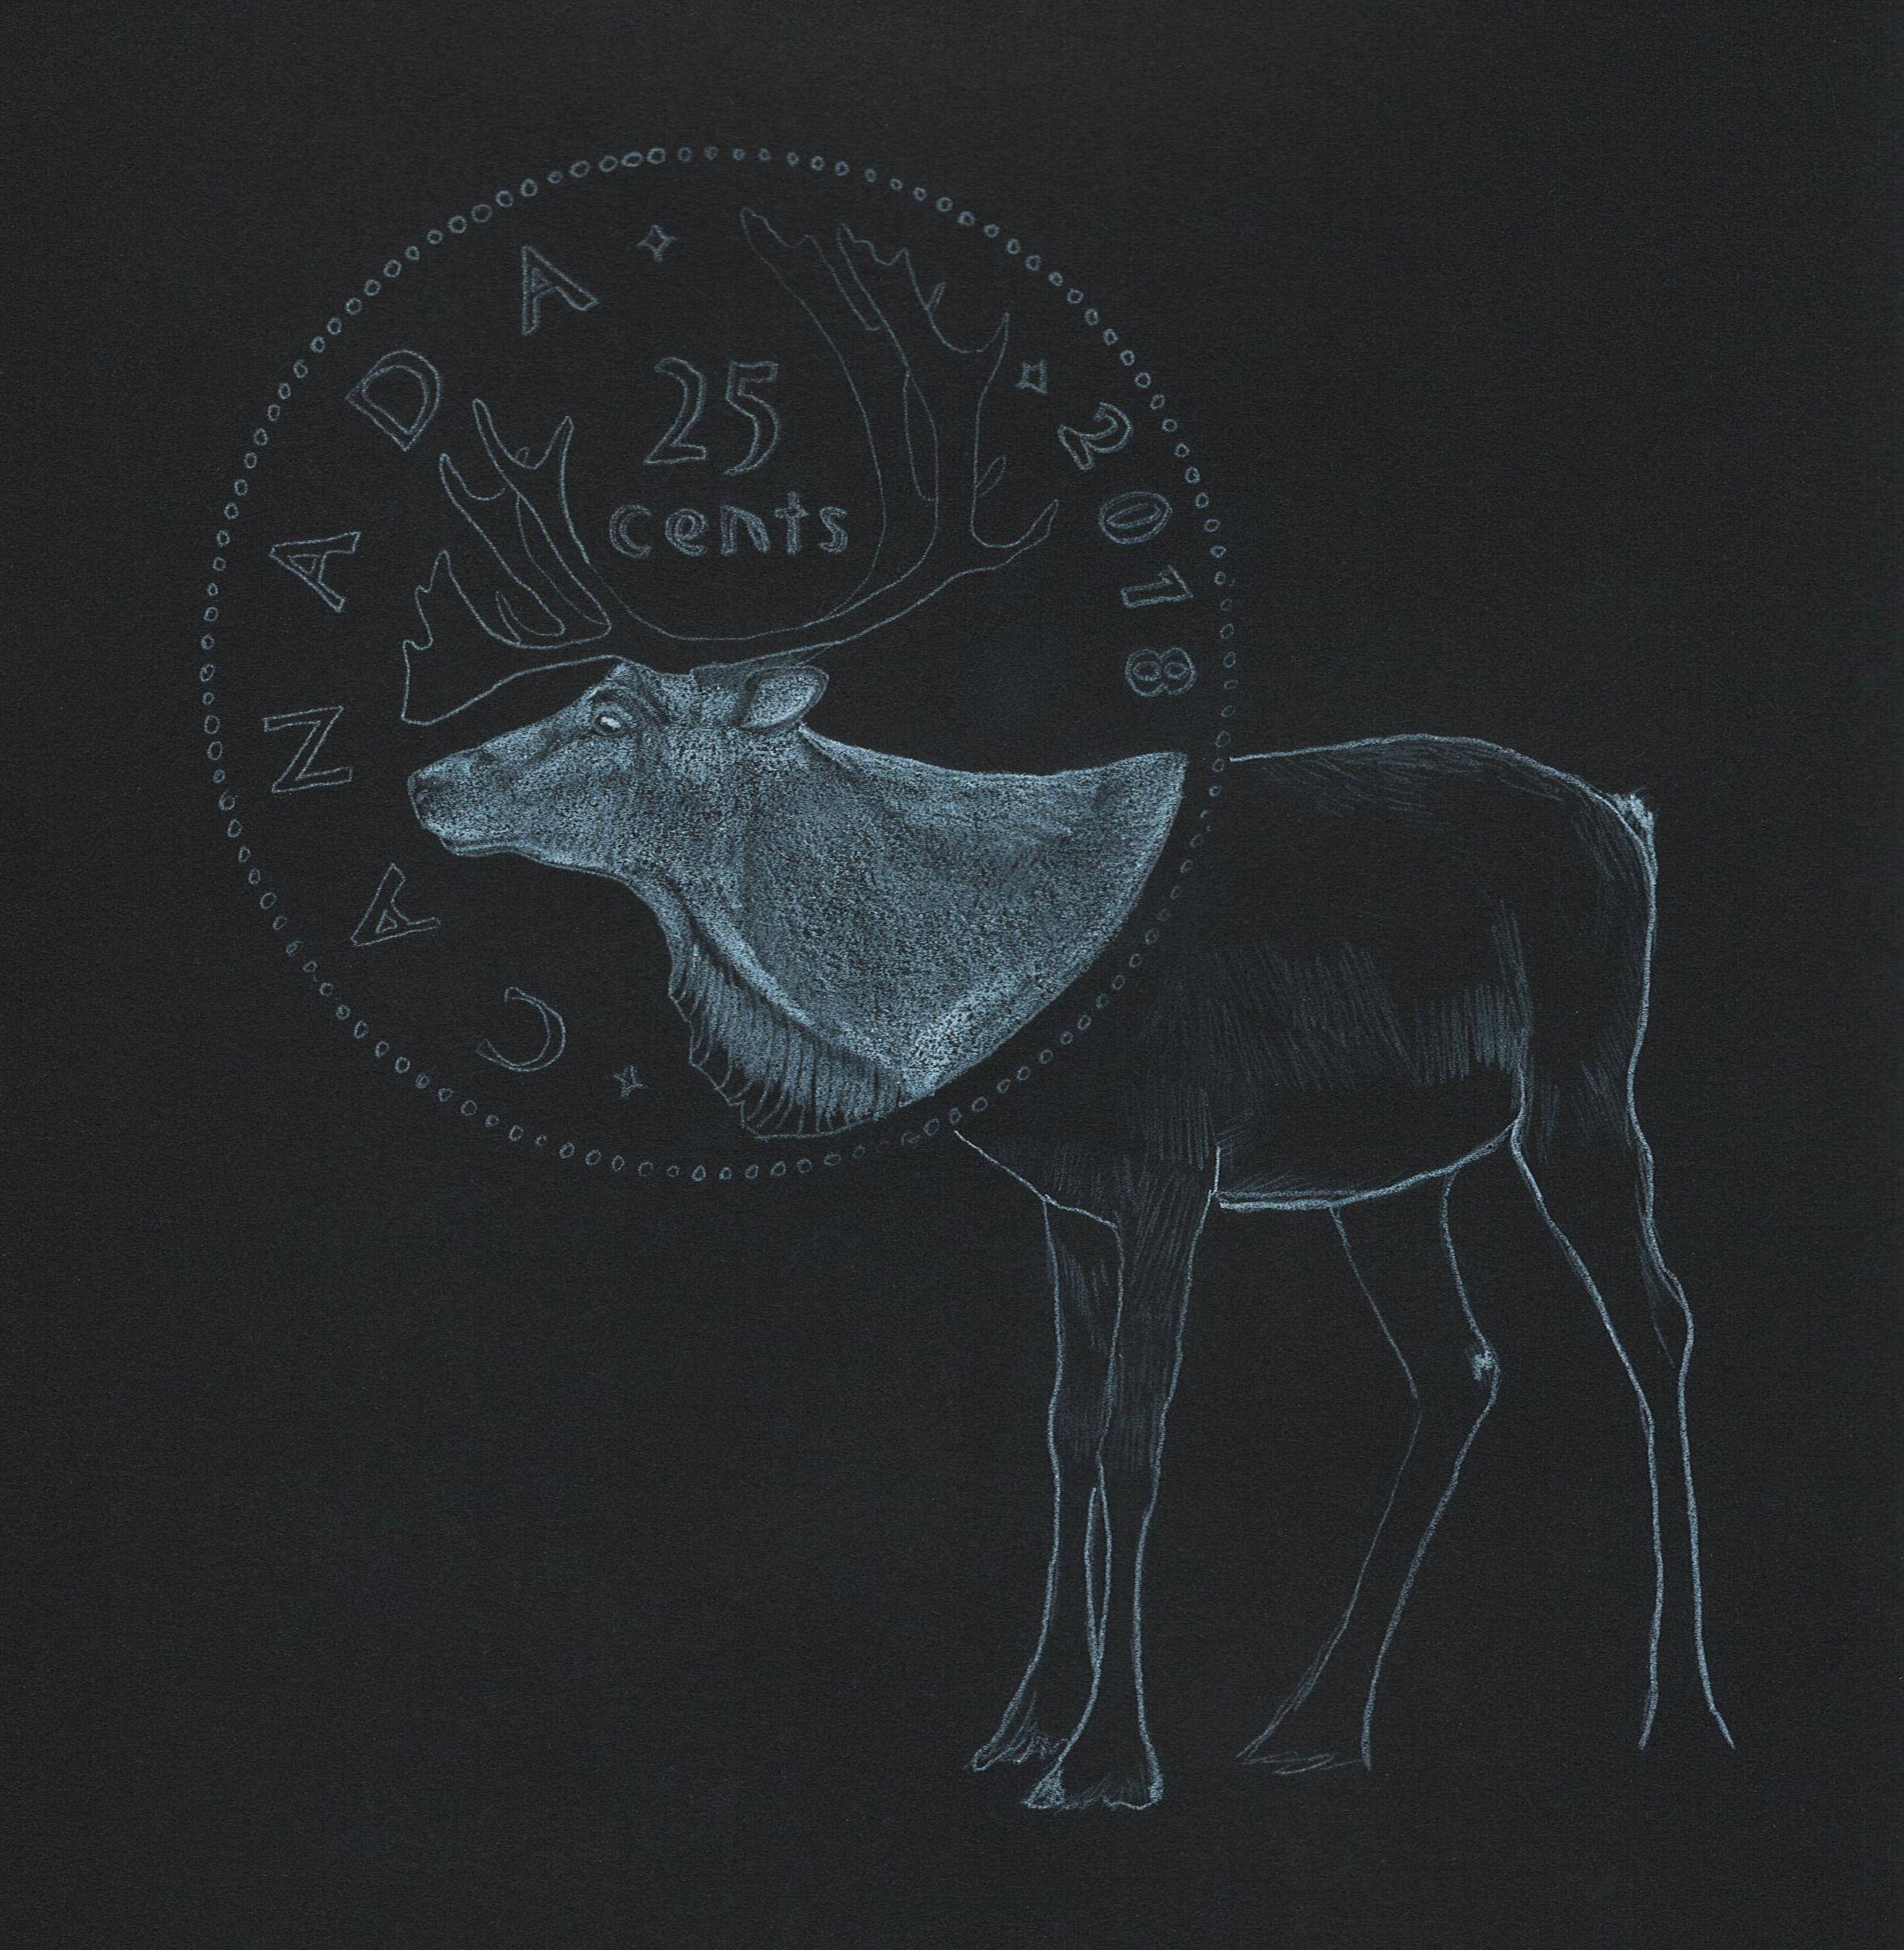 Sarah Ronald - caribou quarter on black.jpg